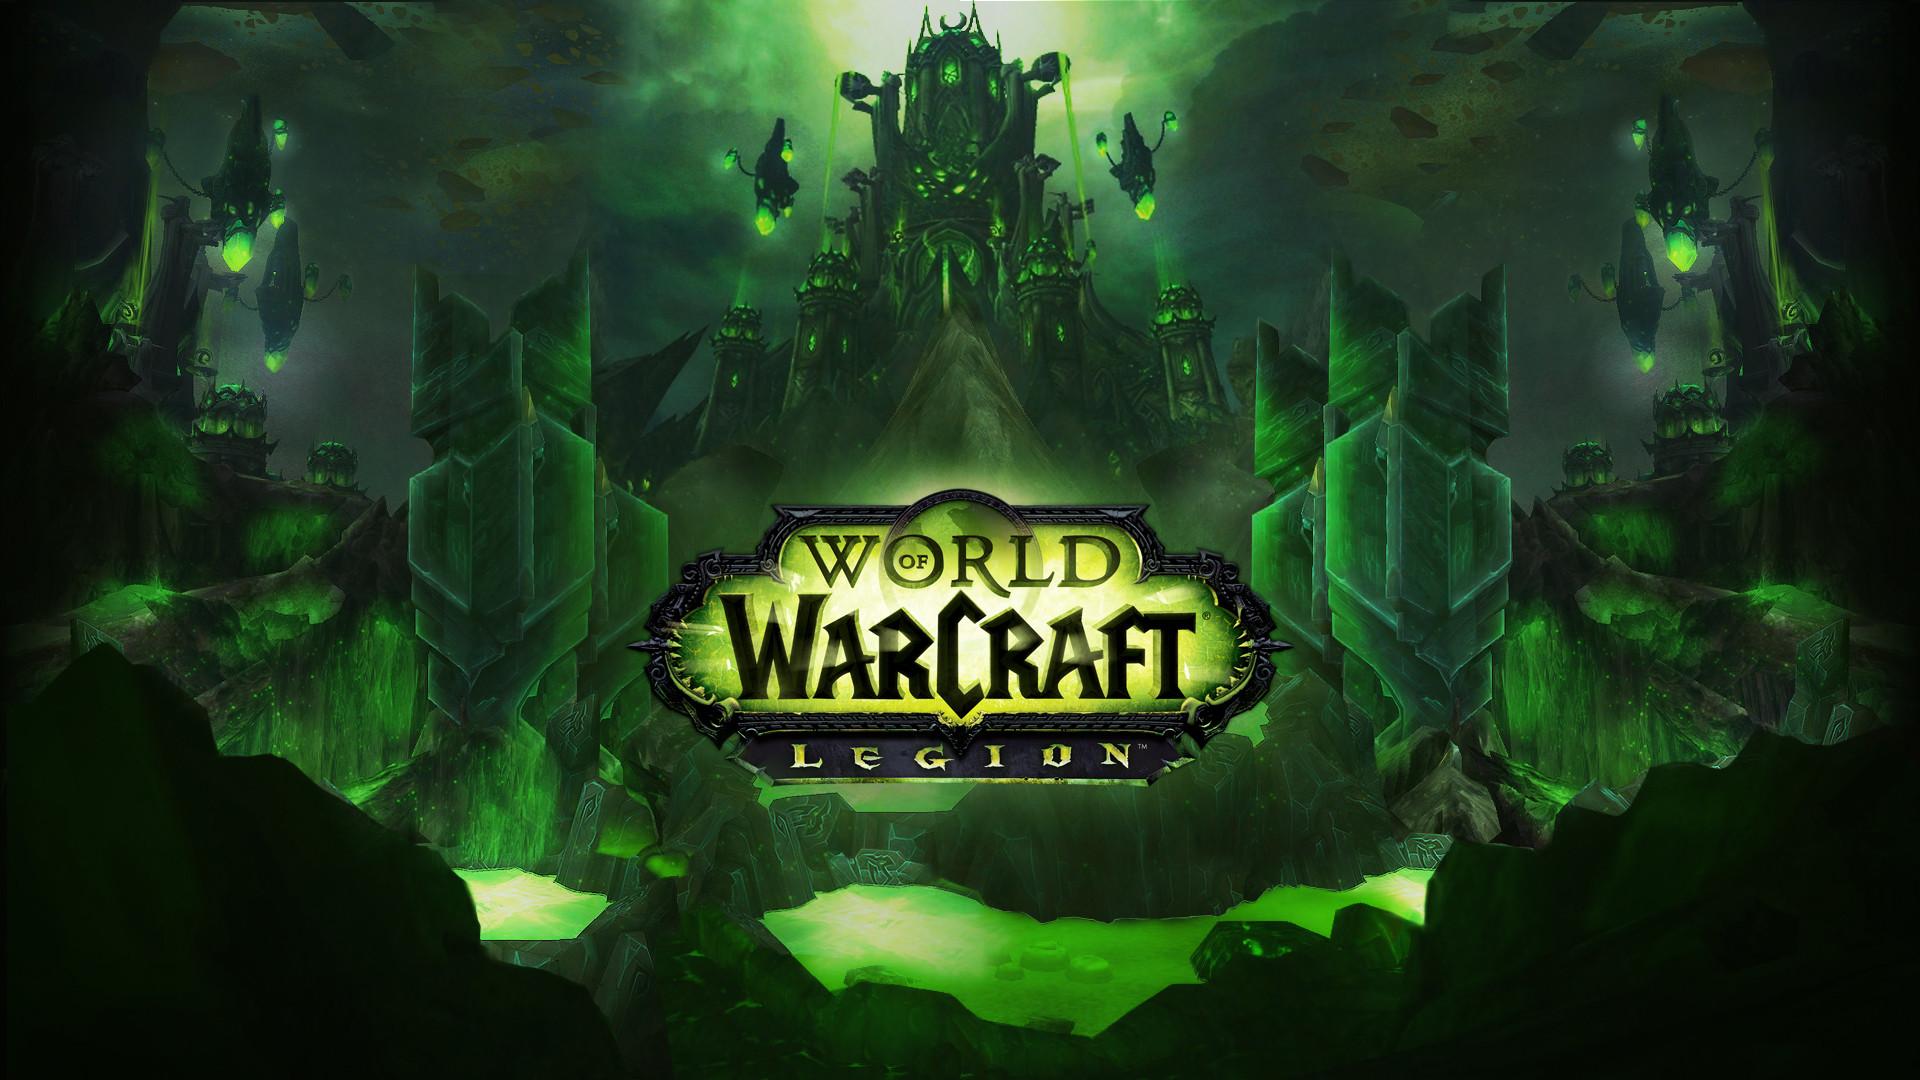 … World of Warcraft: Legion wallpaper by Mokuin